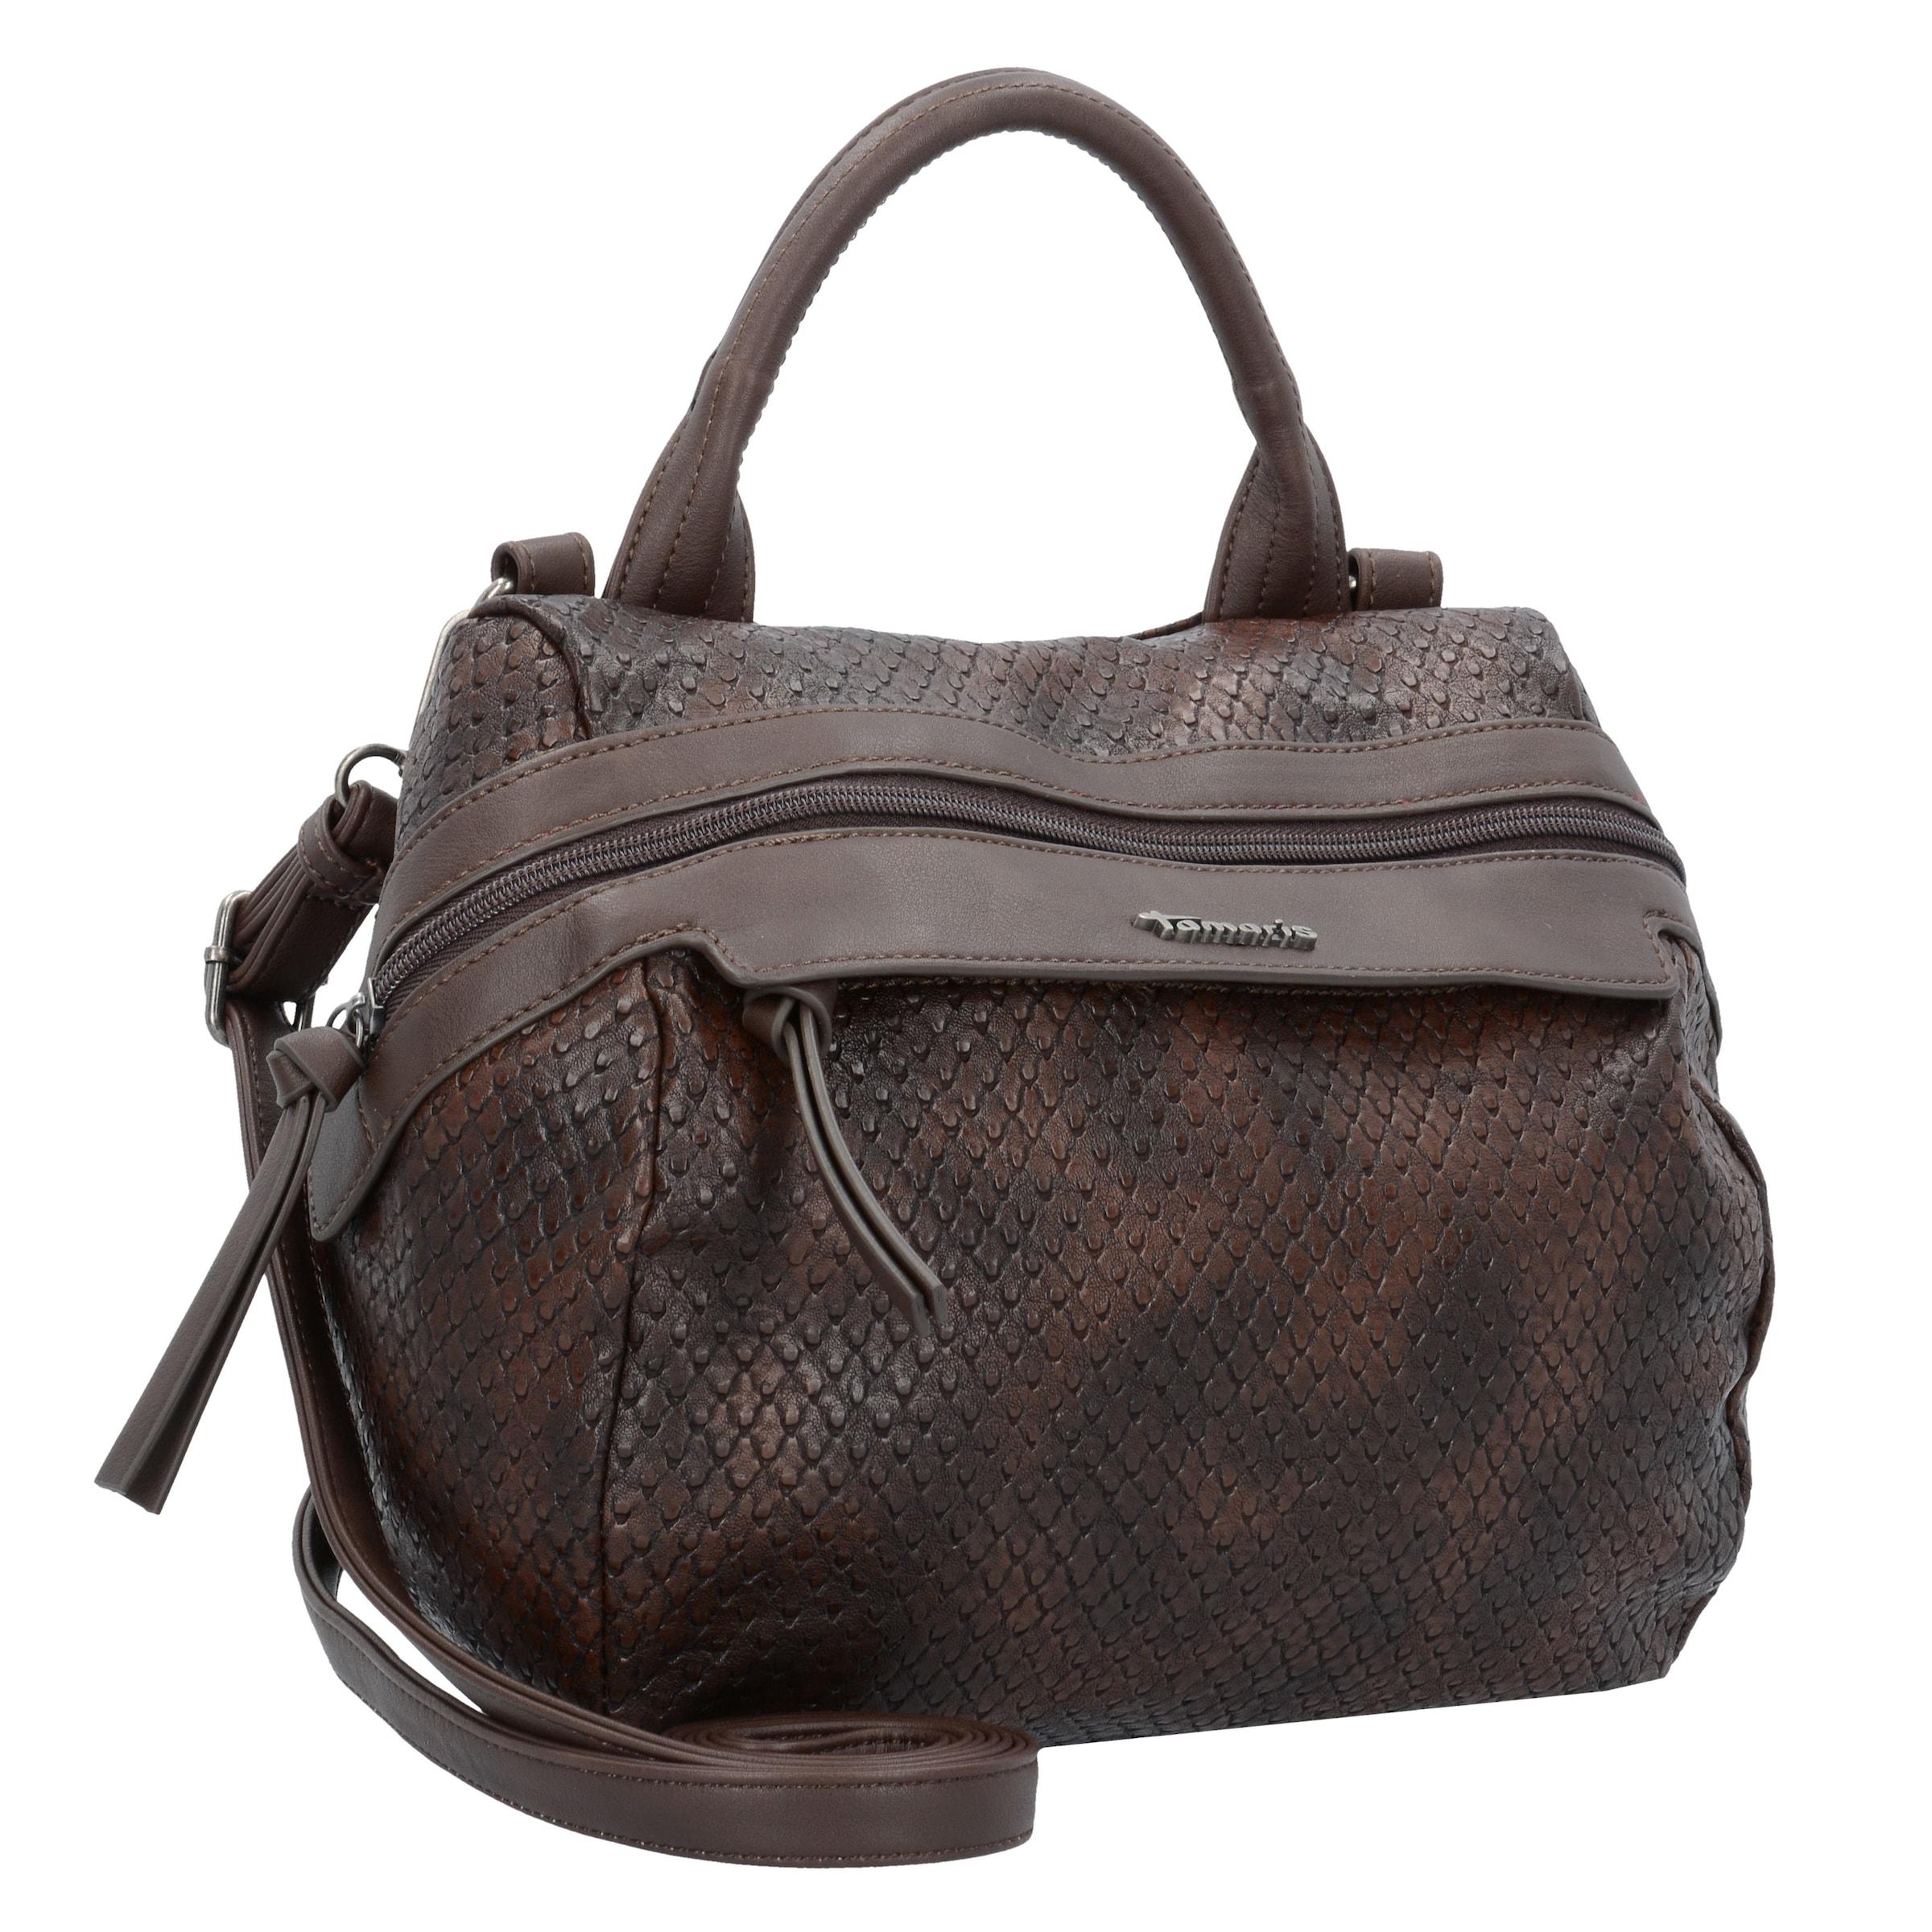 TAMARIS Handtasche 'Ava' Auslass 2018 Neu Wie Viel Billig Verkauf Heißen Verkauf j60NCsCy7